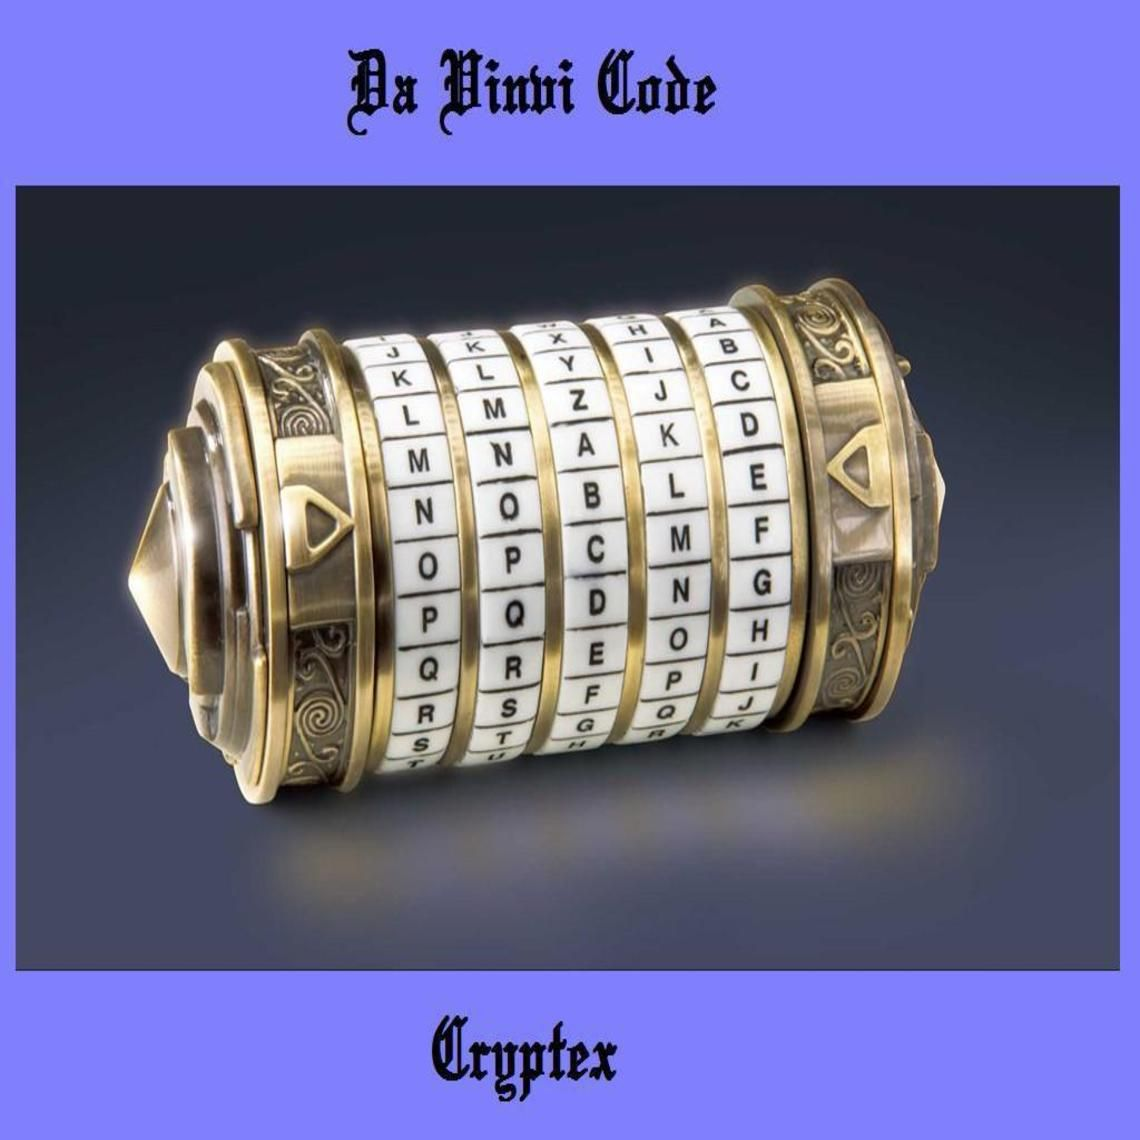 da vinci code cryptex da vinci code cryptex